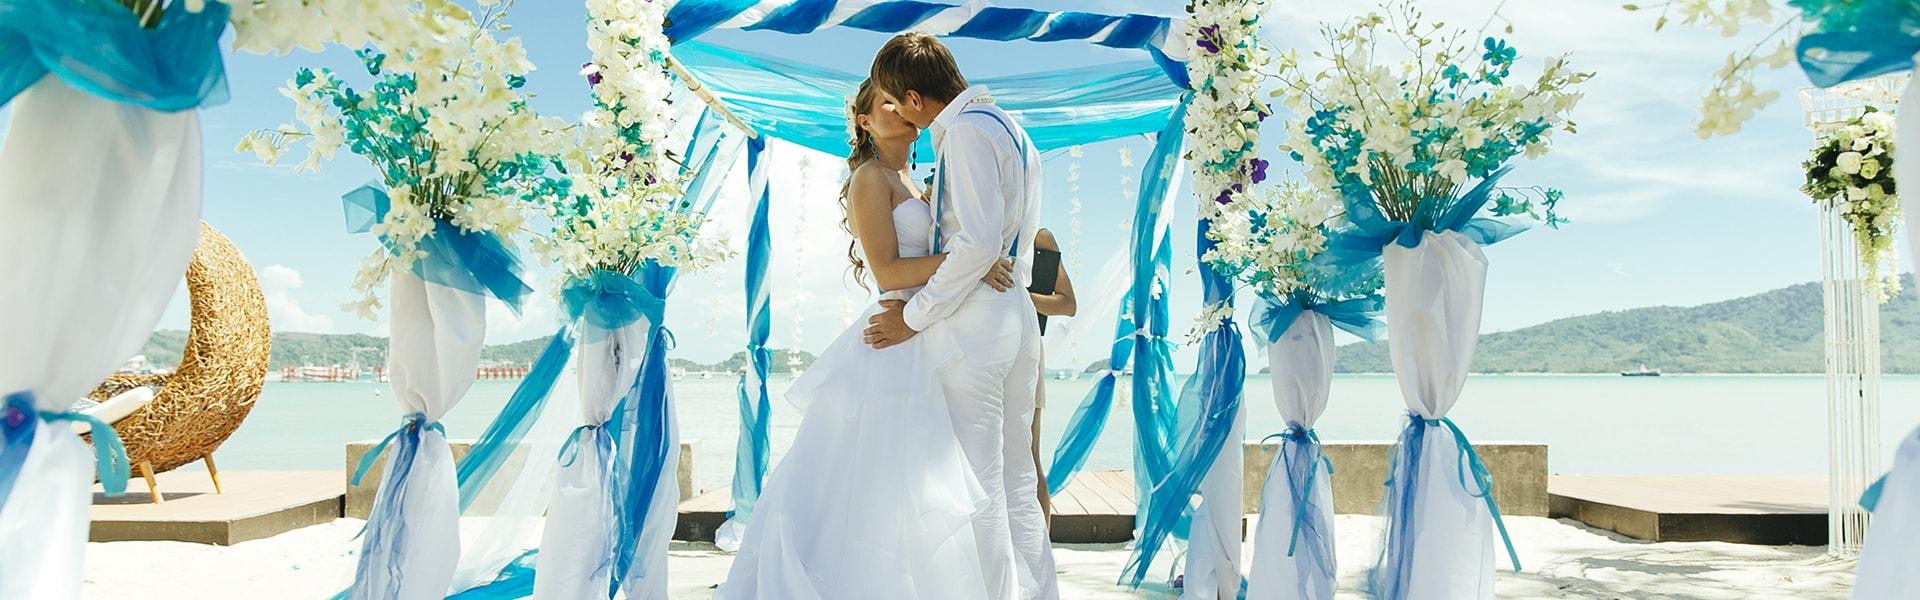 свадебное путешествие proj-zv (3)